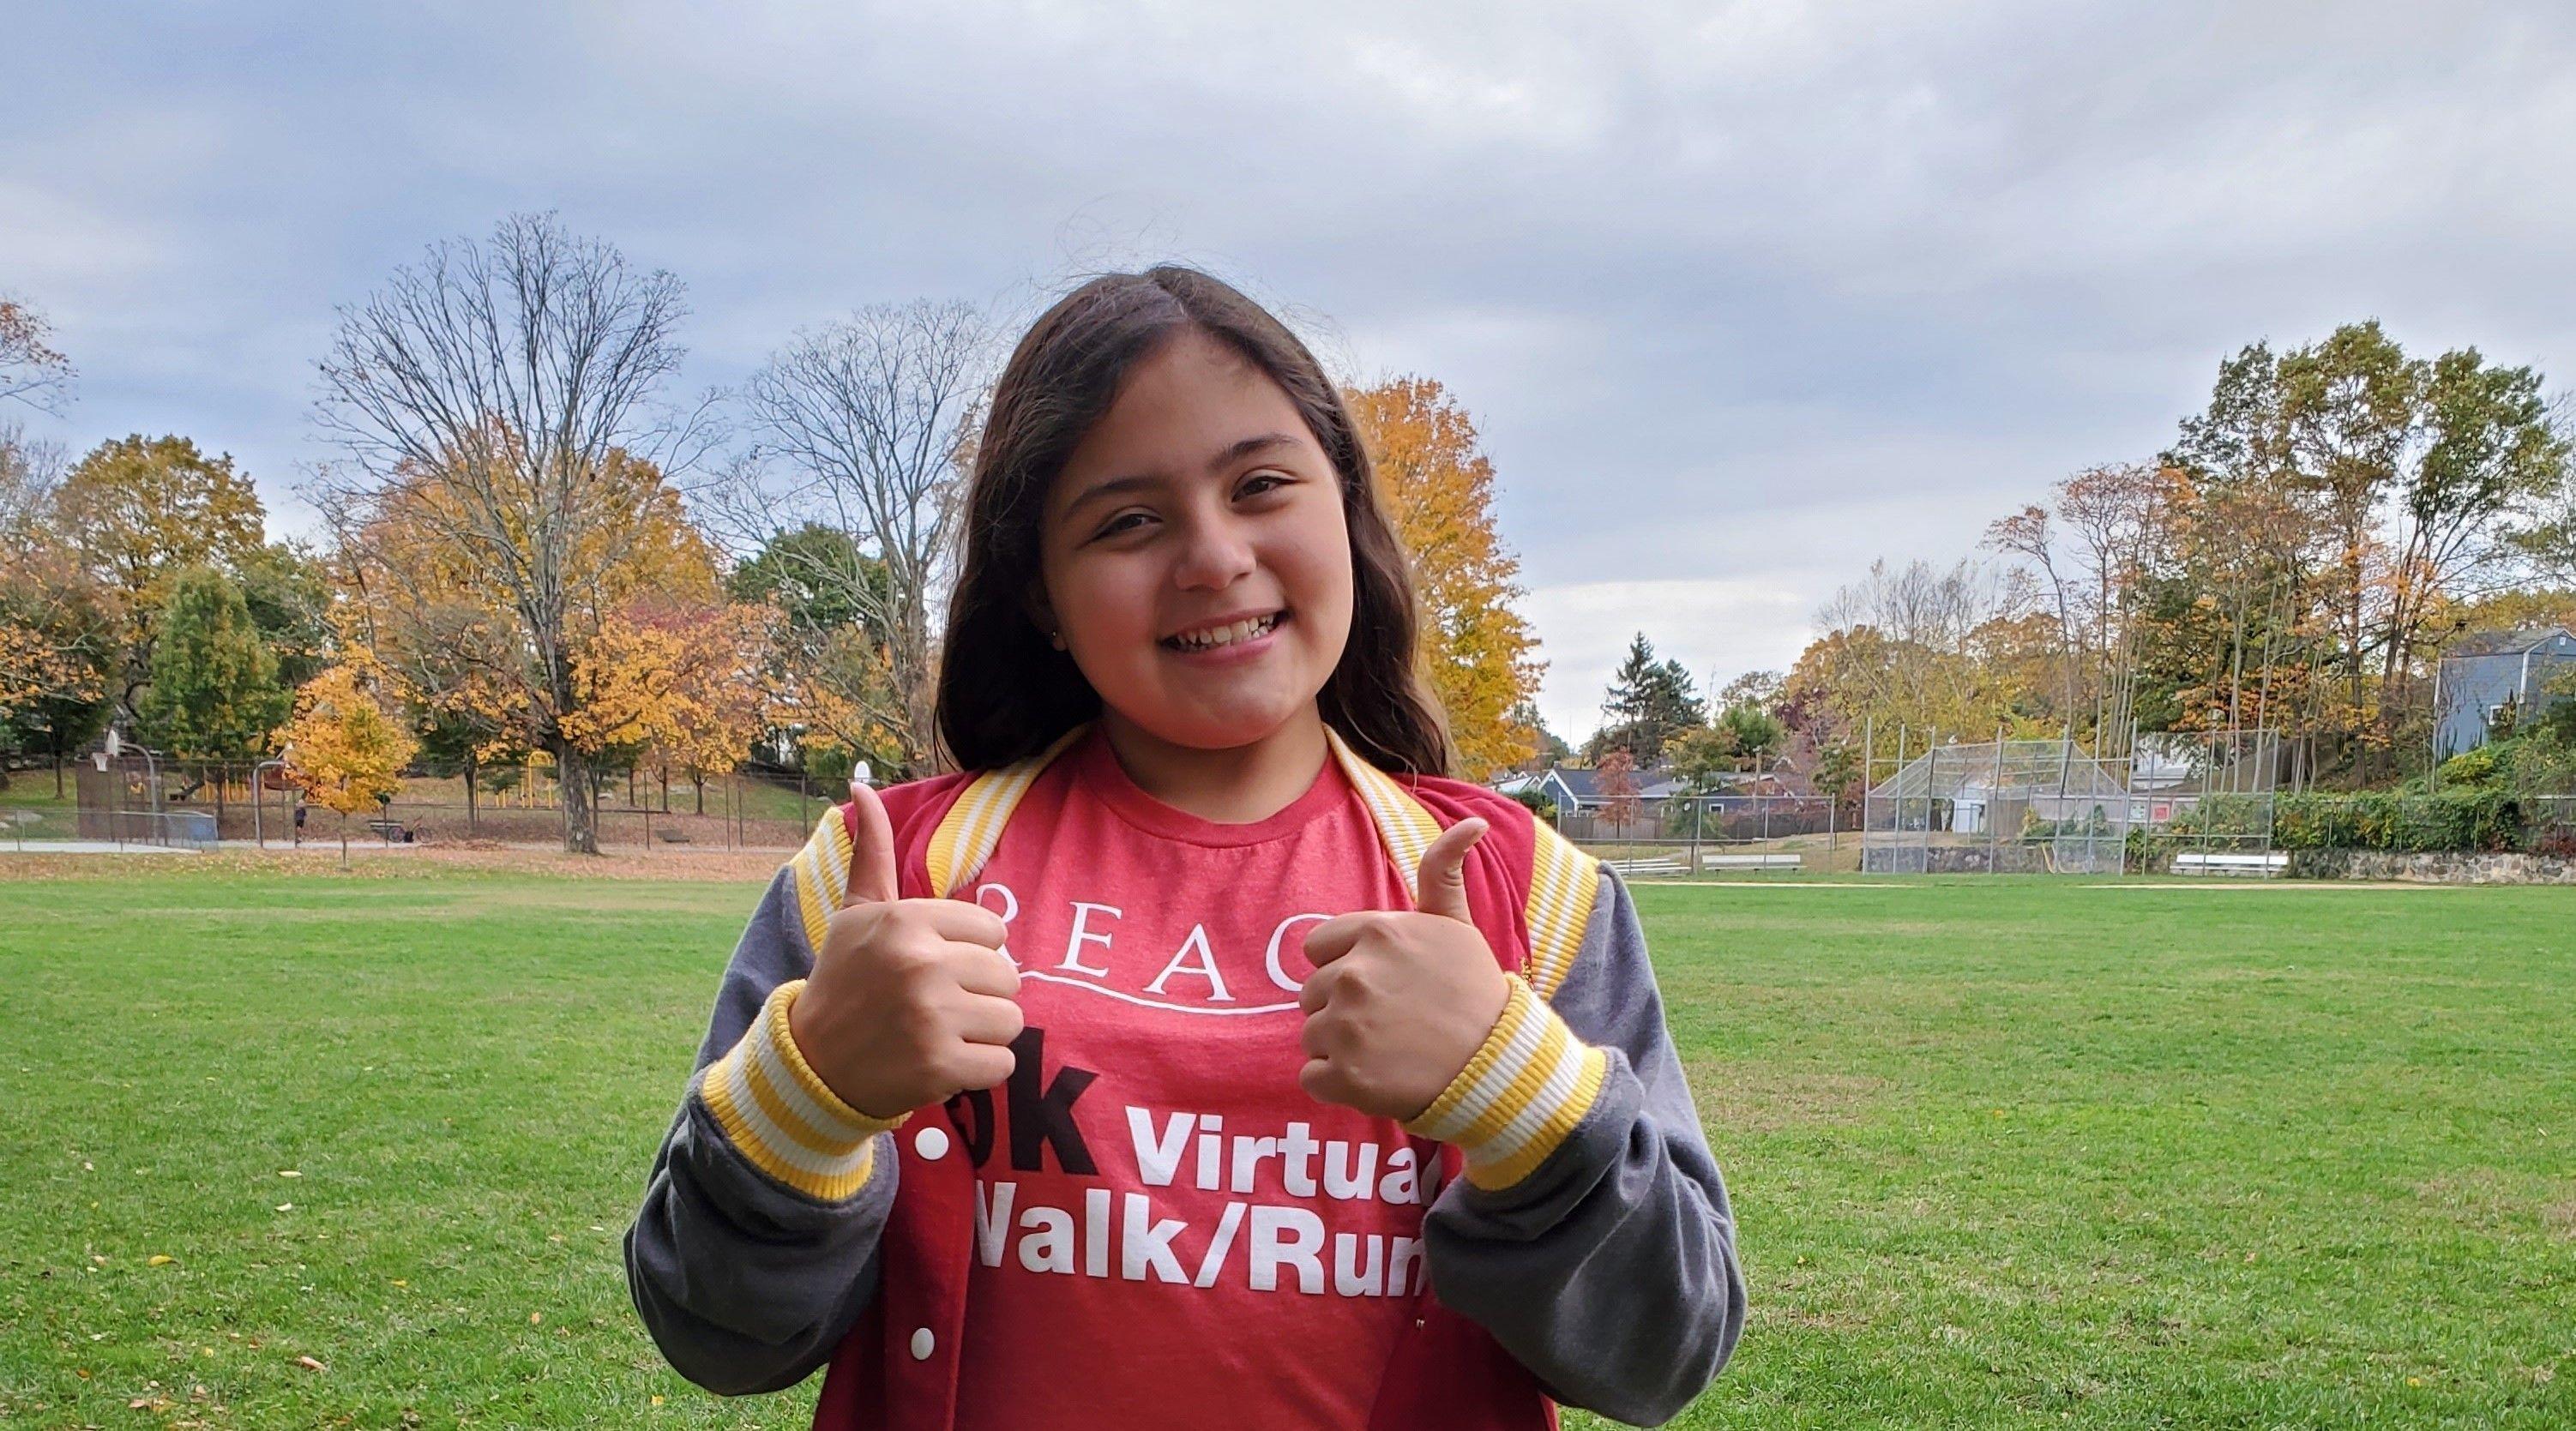 Join our Virtual 5k Walk/Run Fundraiser